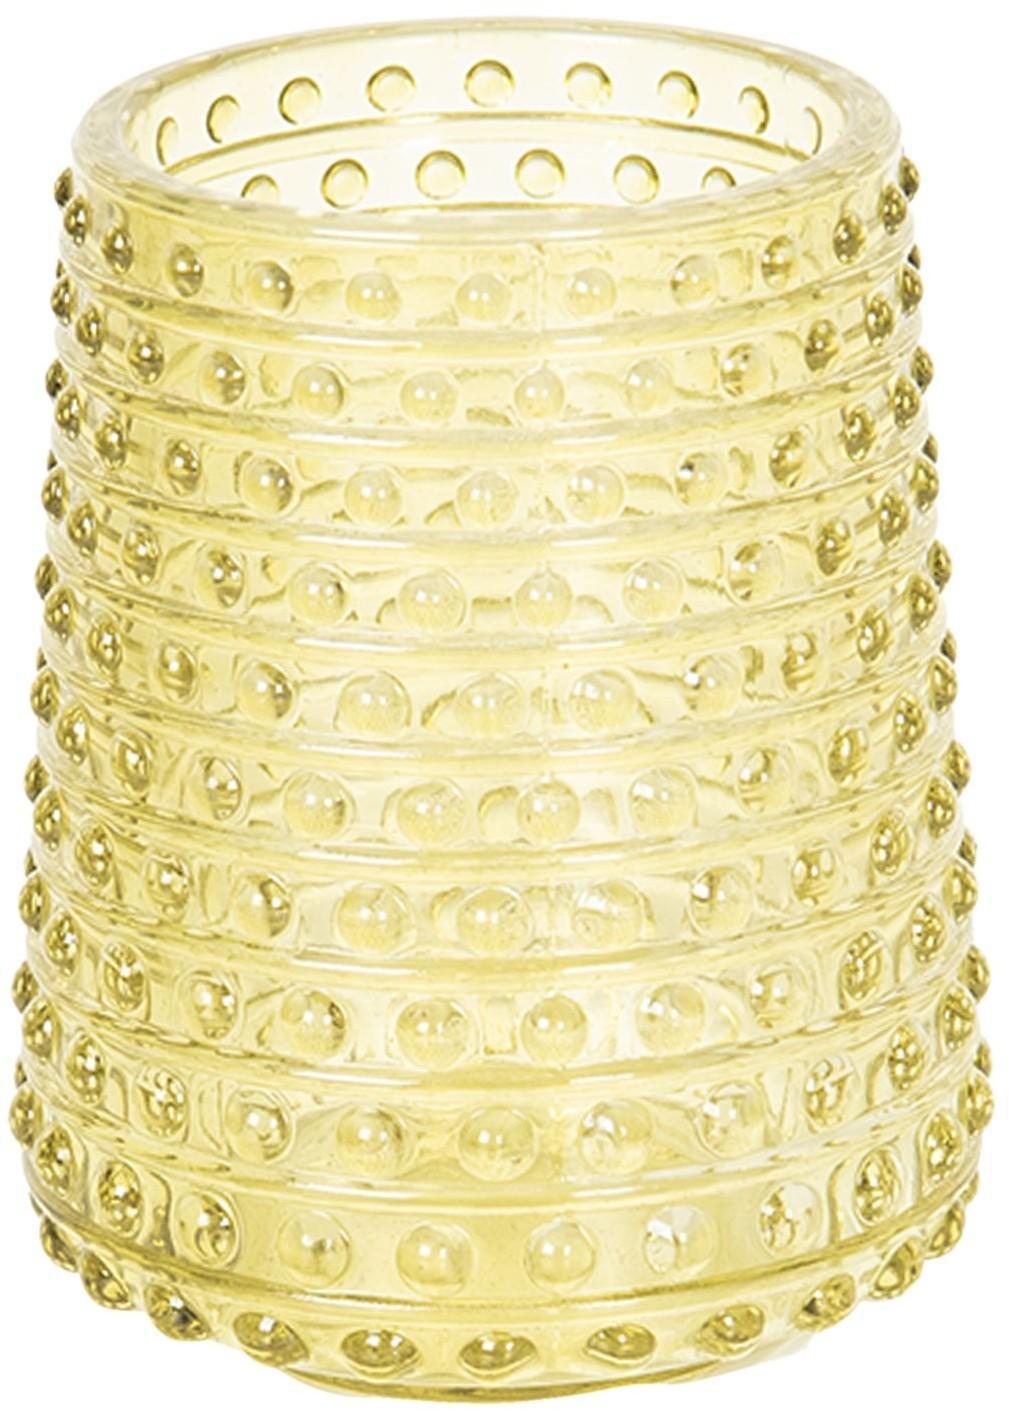 Sklenený svietnik na čajovú sviečku Alain - ∅ 7 * 9 cm